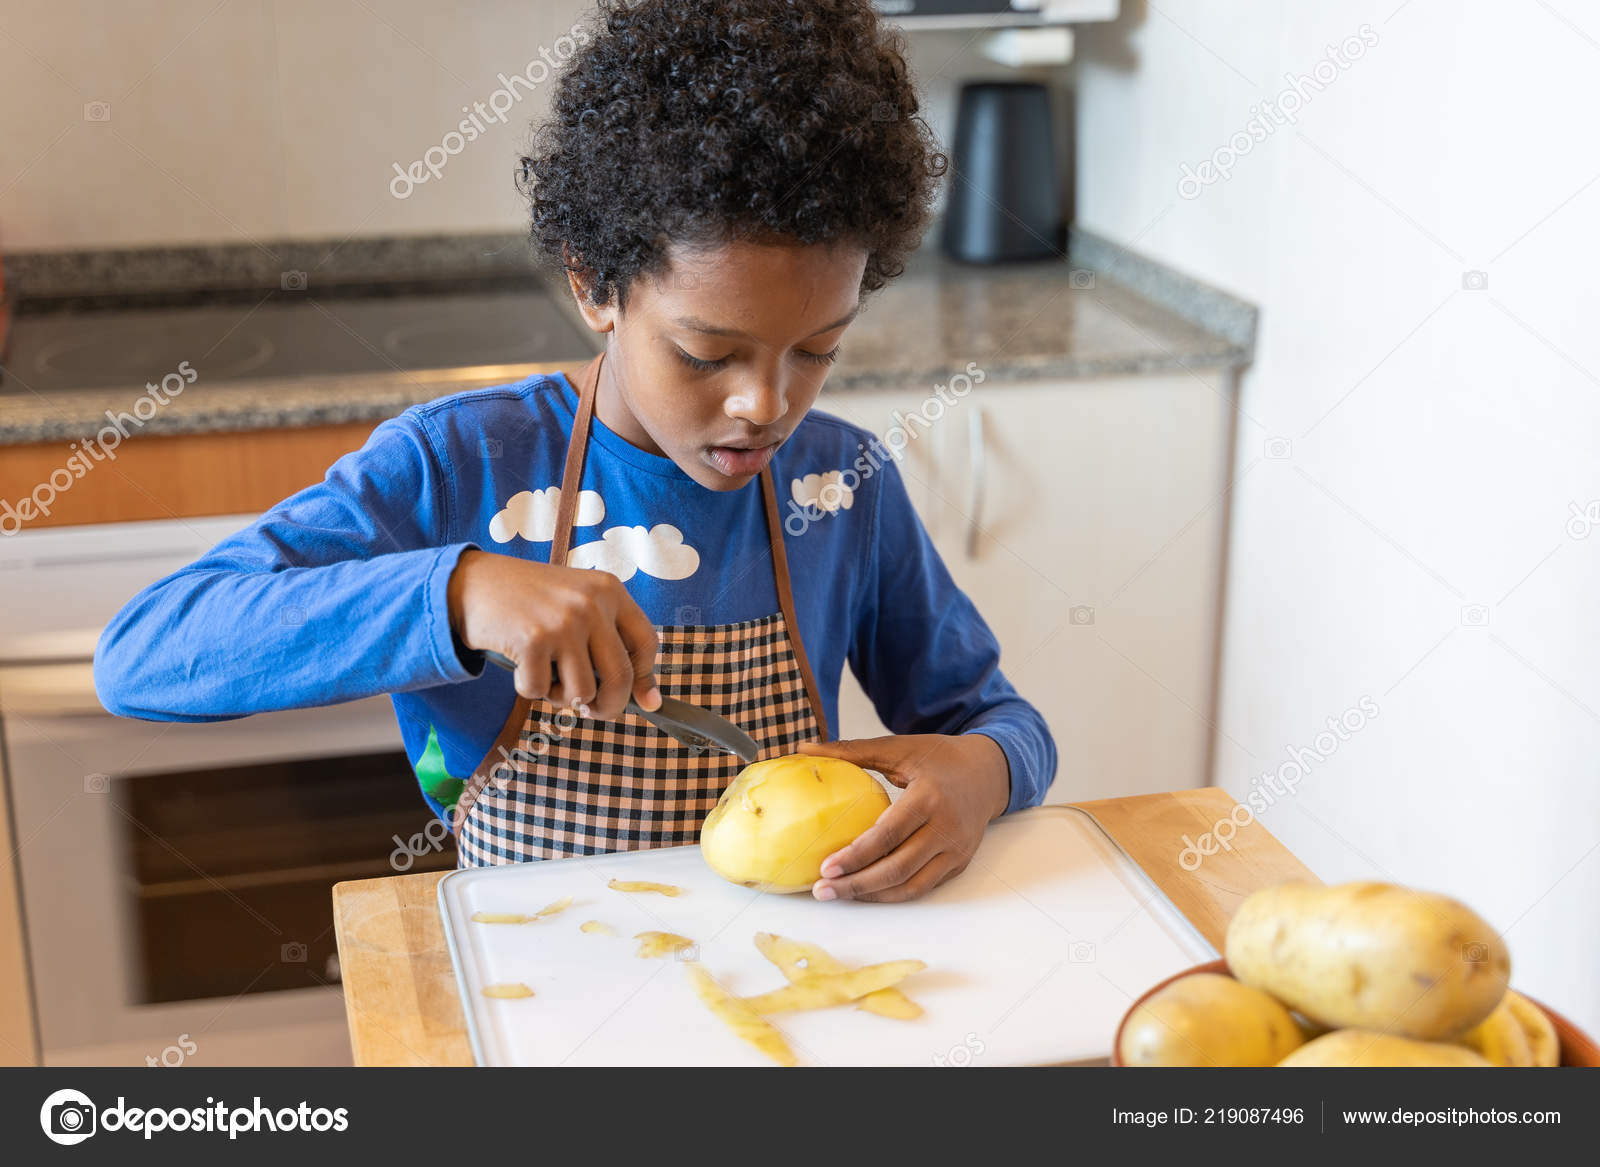 kitchens to go top rated kitchen stoves 小黑男孩打扮成厨师在厨房去皮土豆 图库照片 c danillao 219087496